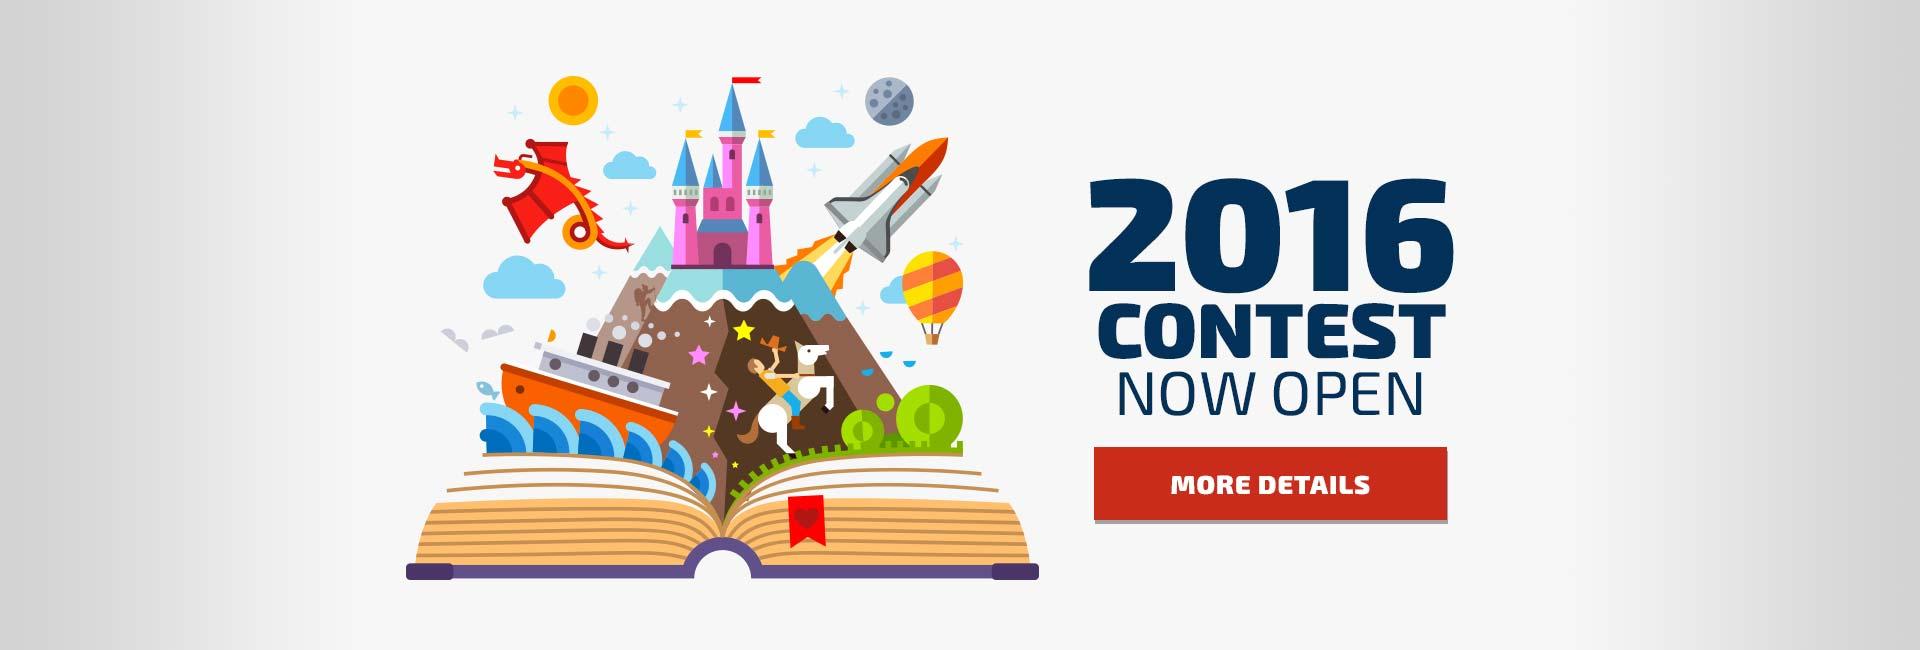 2016 Contest Now Open